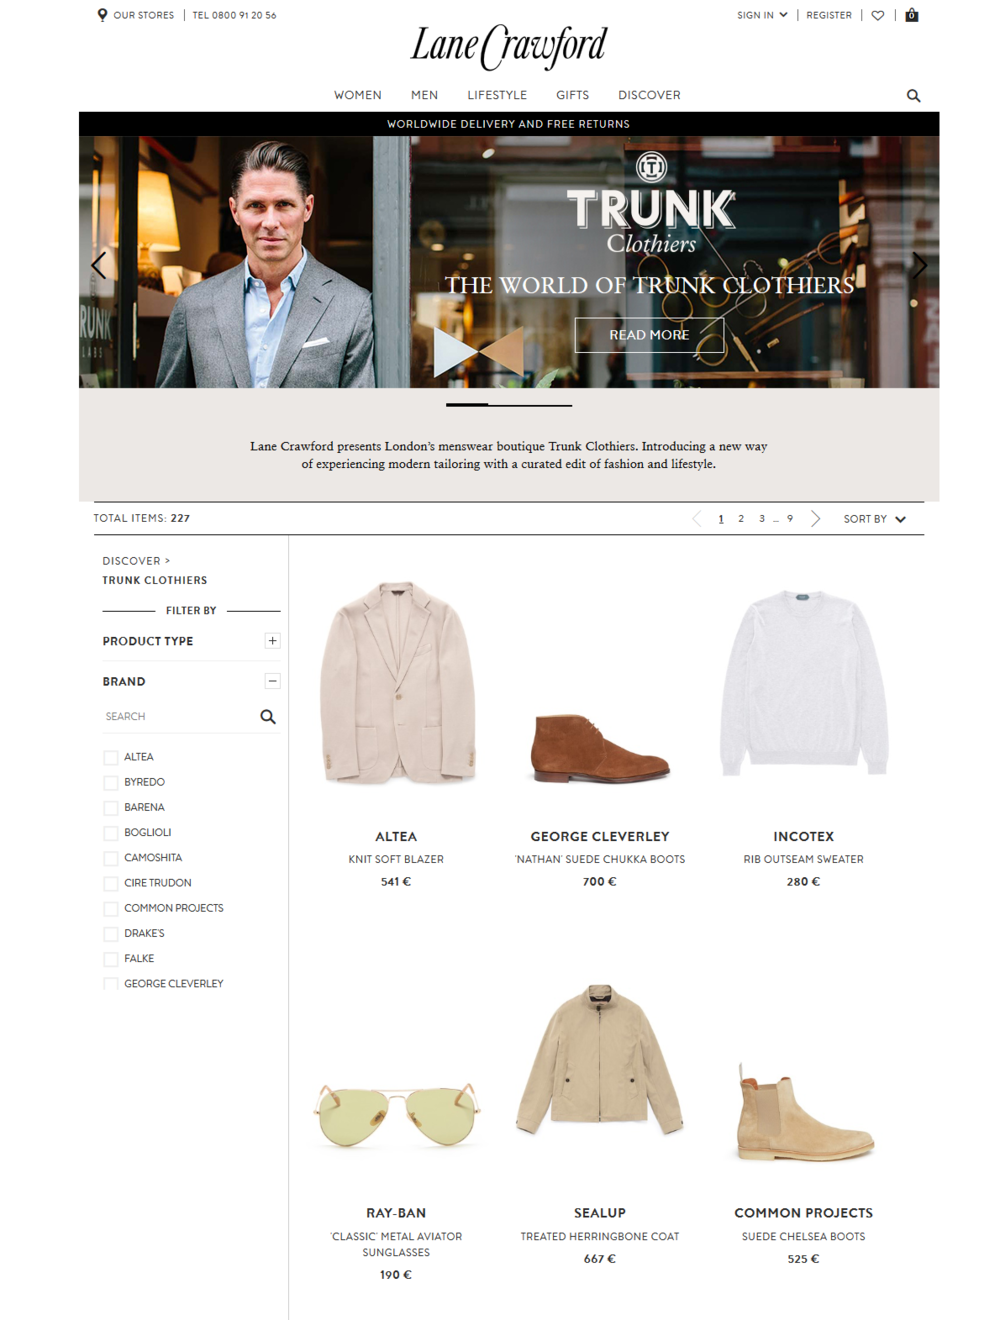 Trunk Clothiers I Lane Crawford.jpg